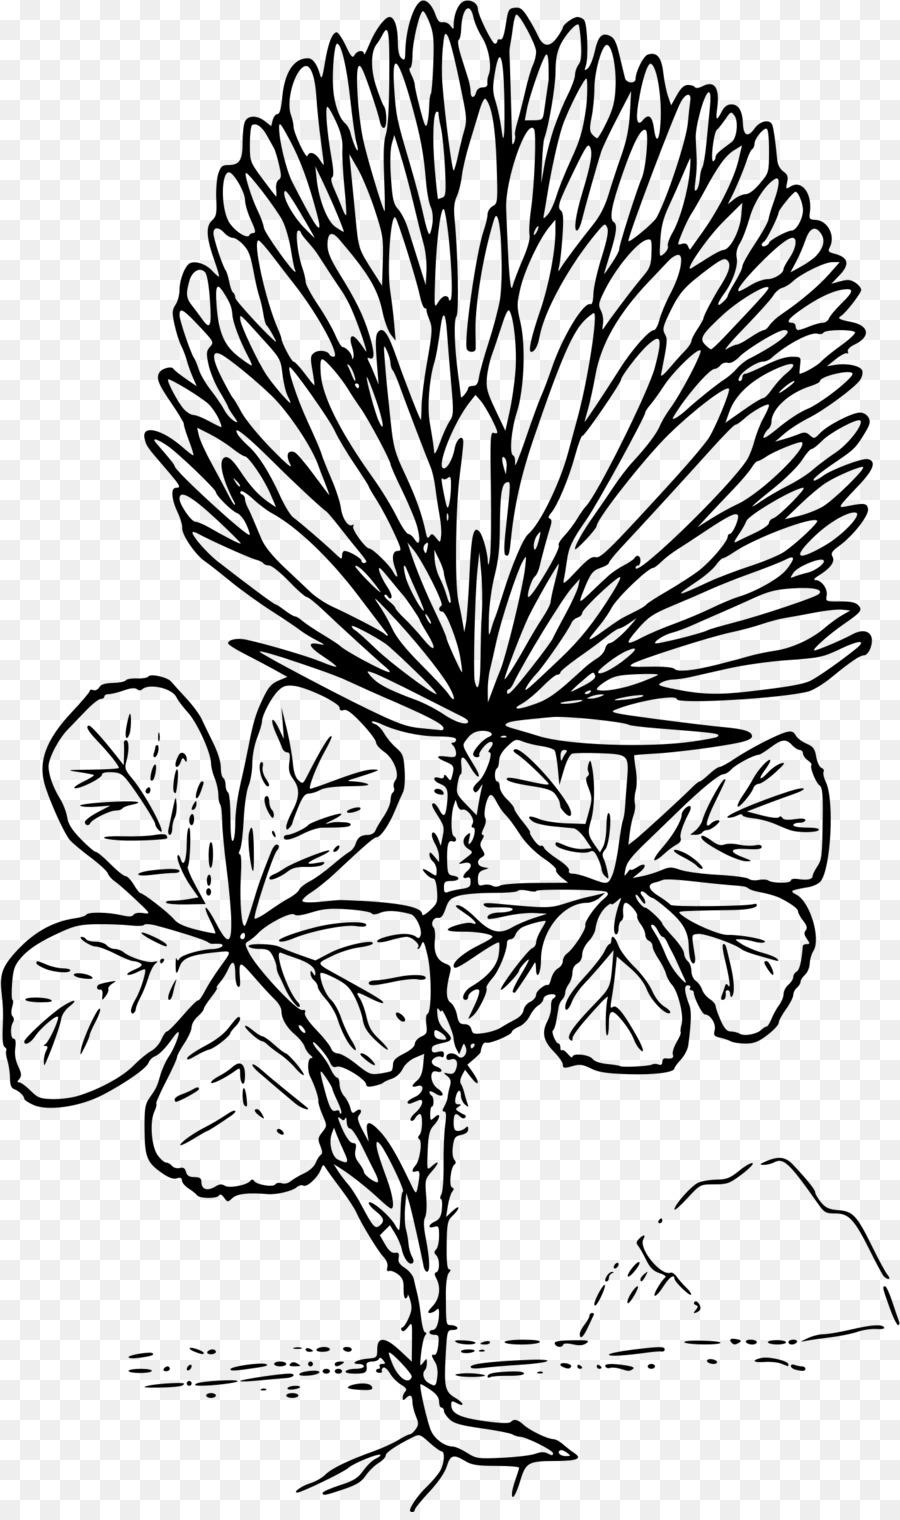 Libro para colorear de trébol de Cuatro hojas de Trébol Rojo Trébol ...